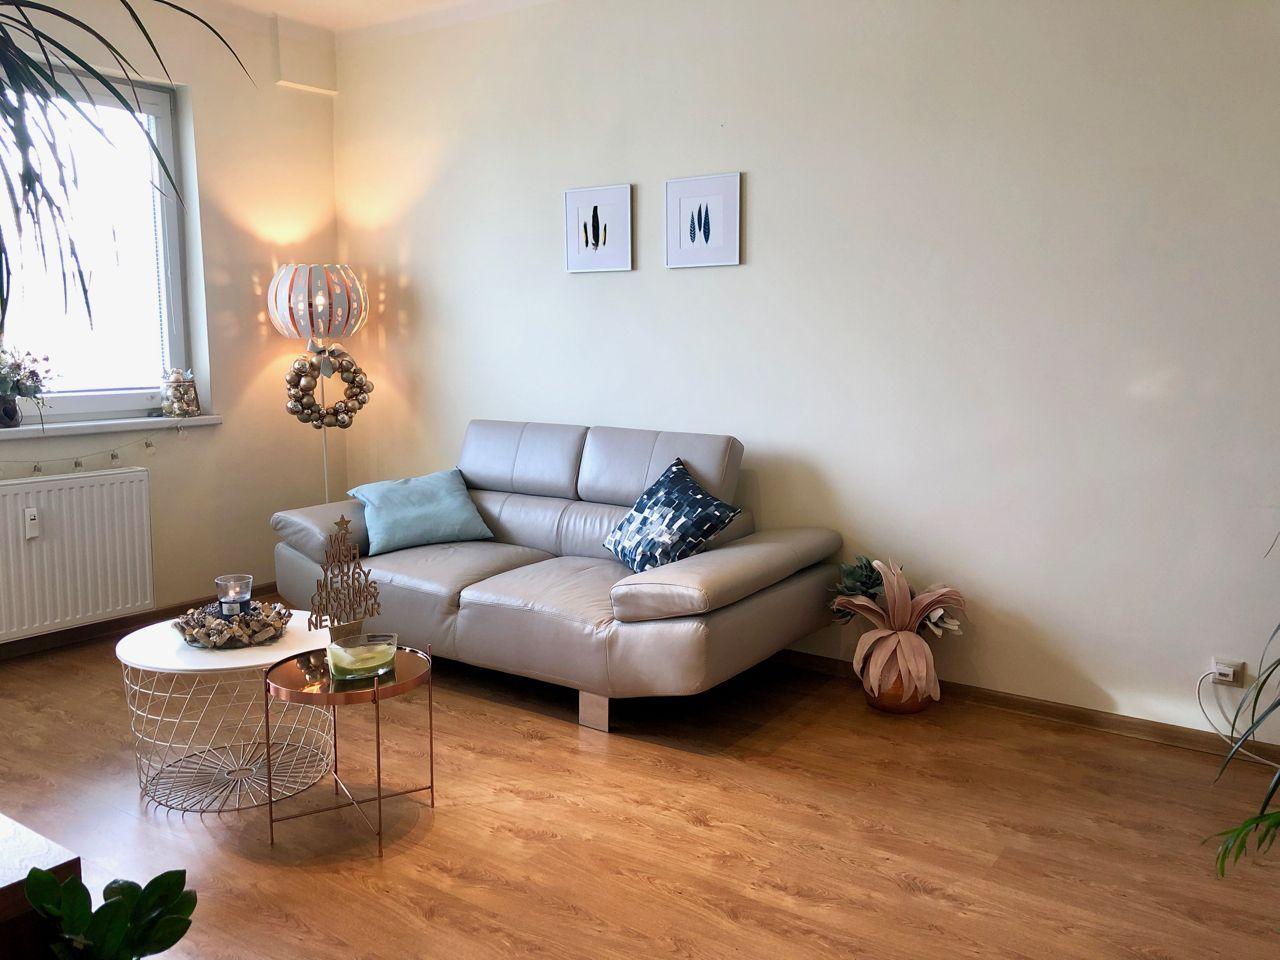 dc3cf17763 DELTA - Kompletne zrekonštruovaný 2 izb. byt